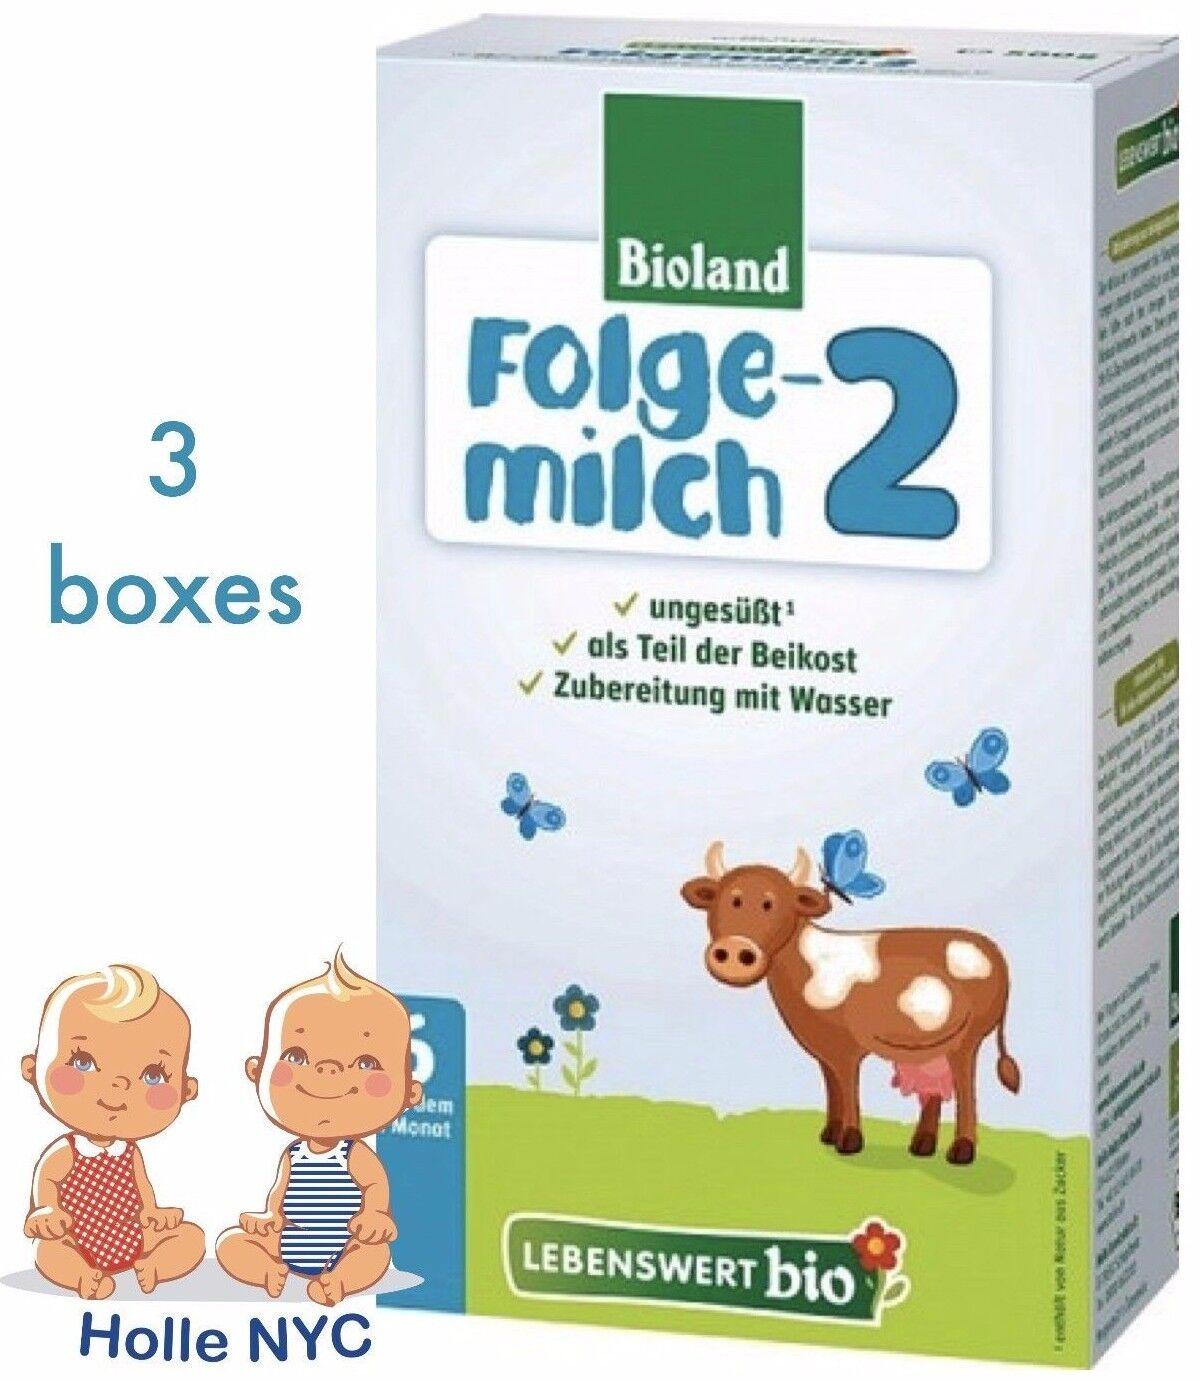 Holle Lebenswert Stage 2 Organic Formula,3 BOXES,500g 10/2019 FREE SHIPPING - $58.95